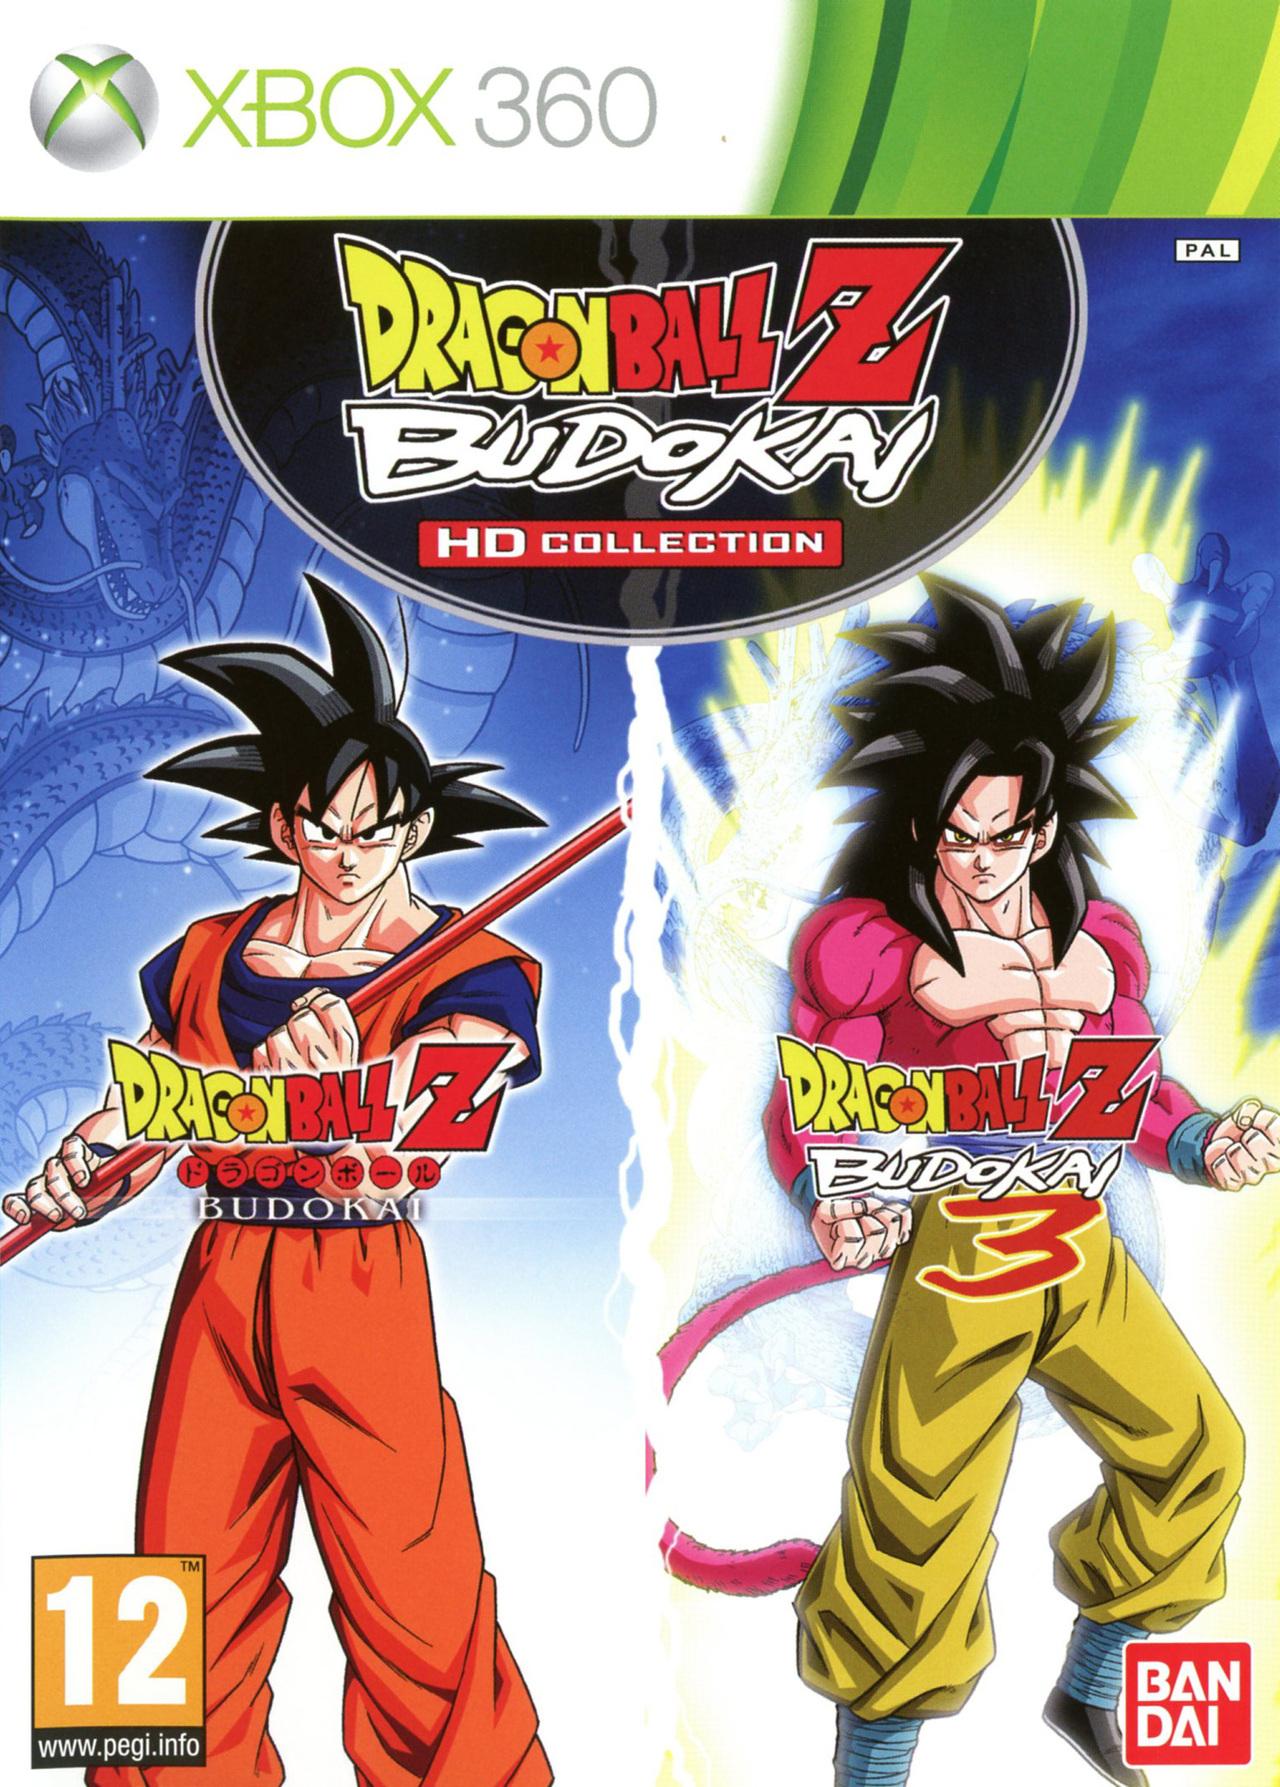 jeuxvideo.com Dragon Ball Z : Budokai HD Collection - Xbox 360 Image 1